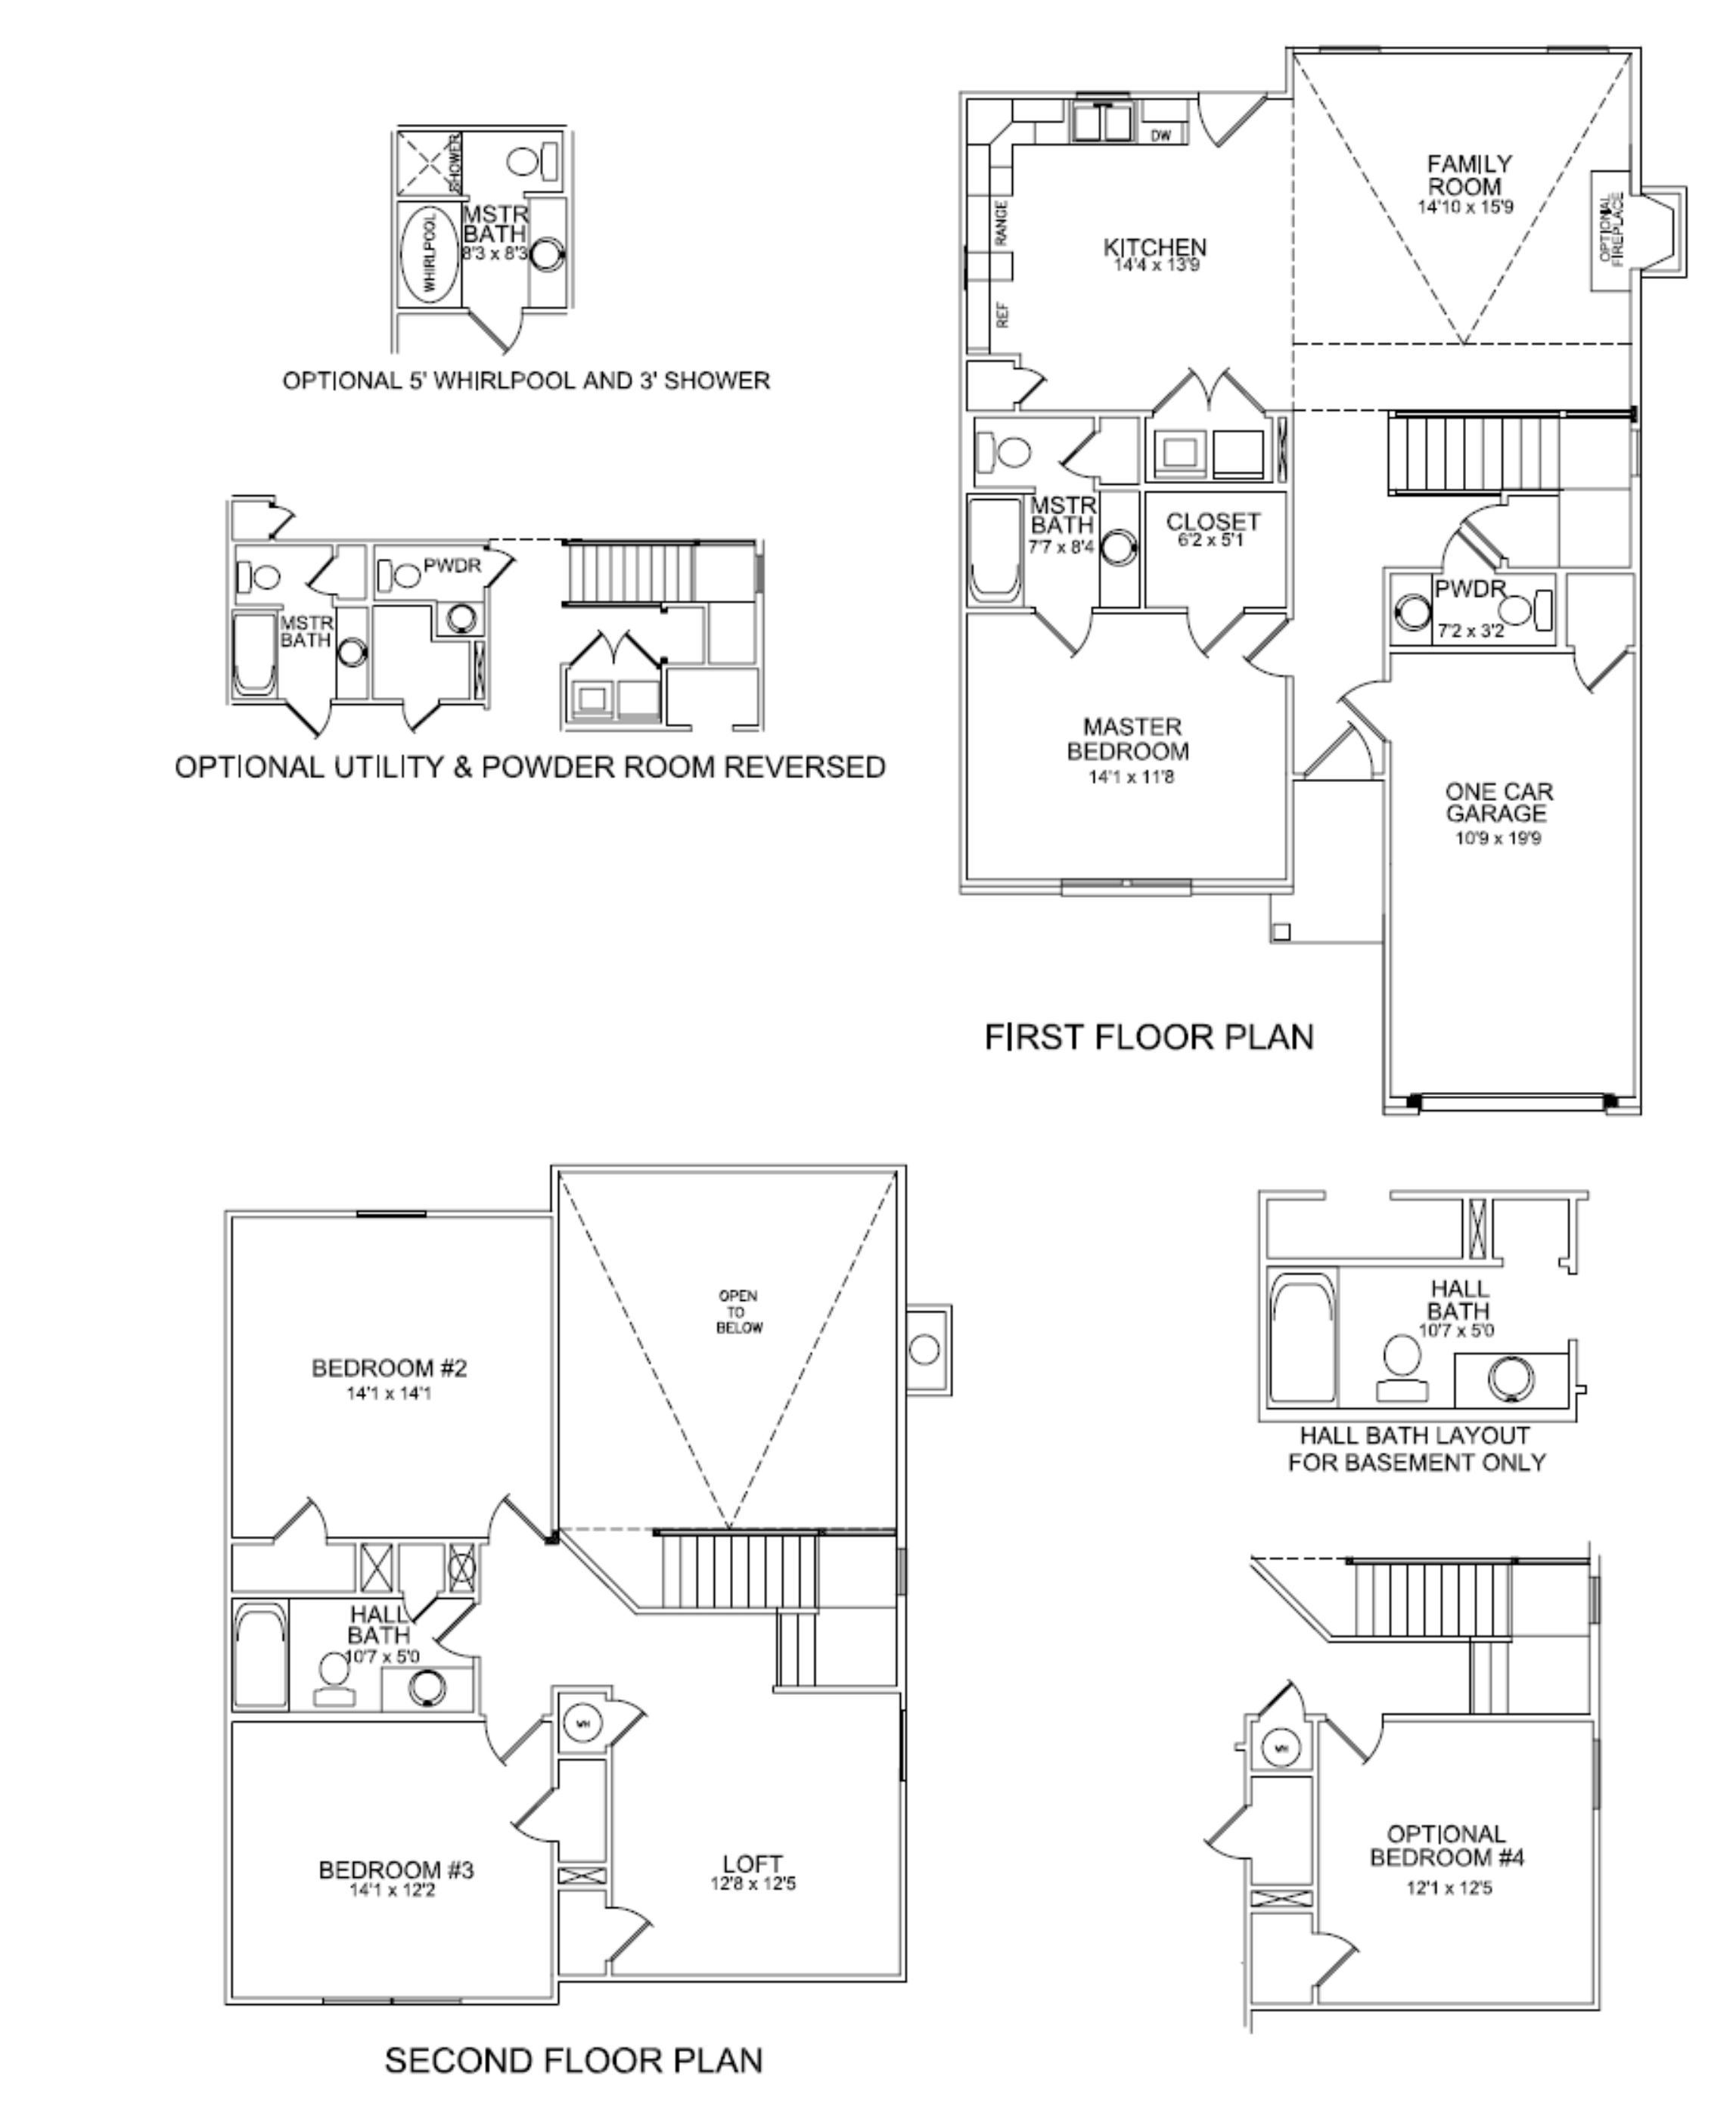 Floor Plans Mercer One Car Lexington Kentucky Real Estate